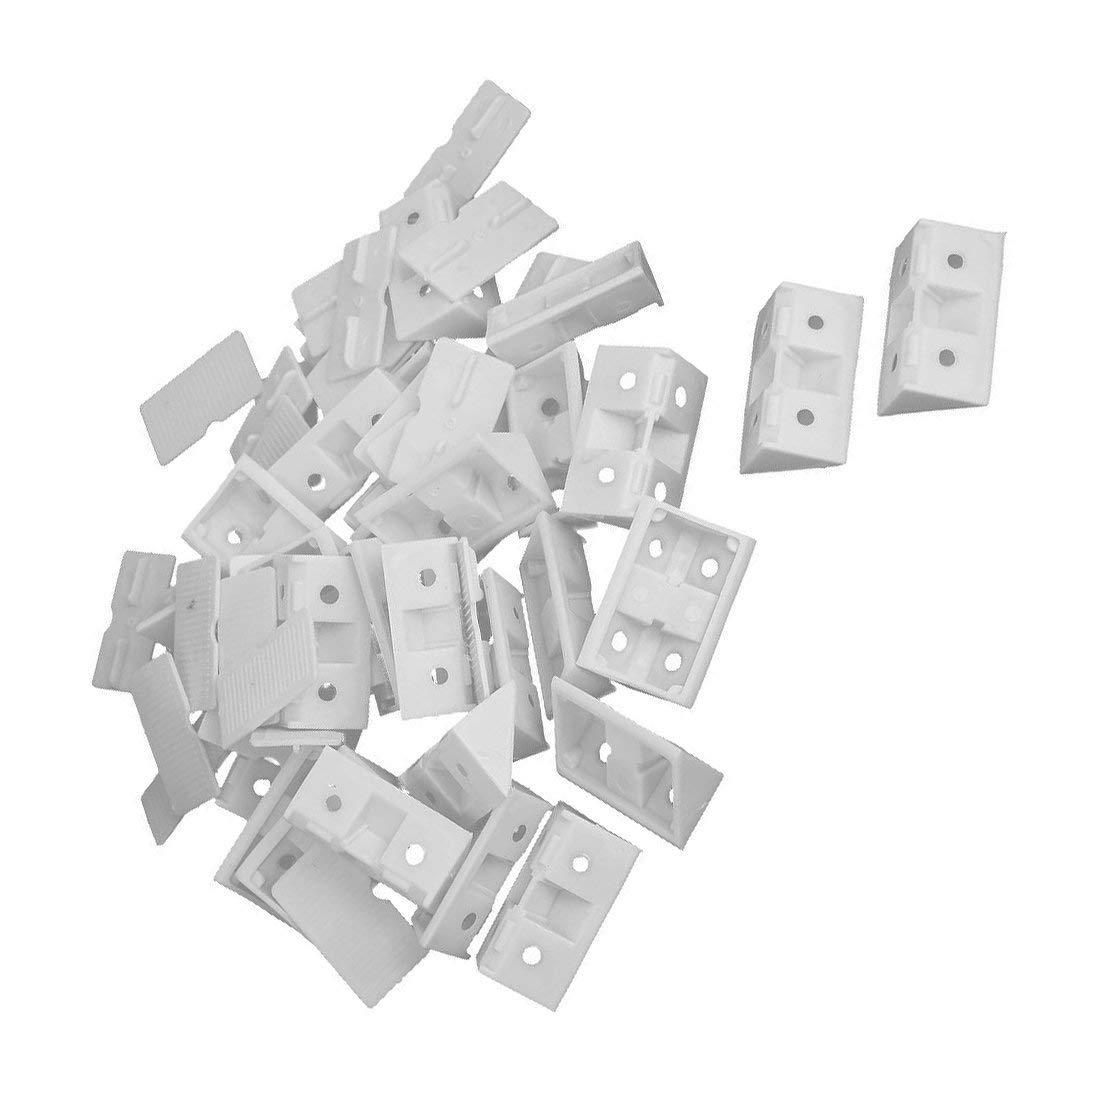 Axiwen 30pcs Shelf Cabinet 90 Degree Plastic Corner Braces Angle Brackets White